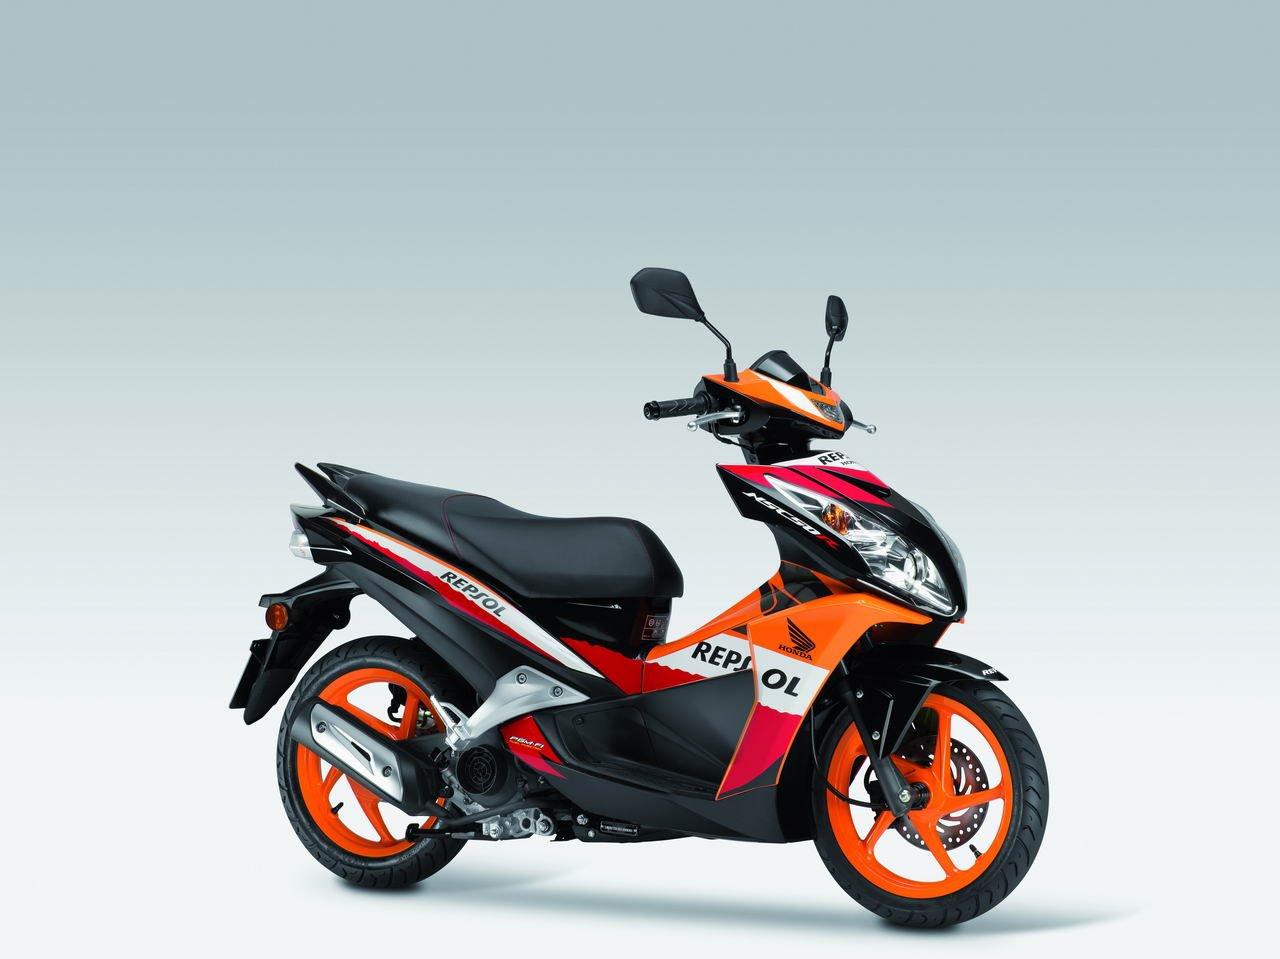 Listino Honda CB 500F Naked Media - image 14692_honda-nsc50r on http://moto.motori.net